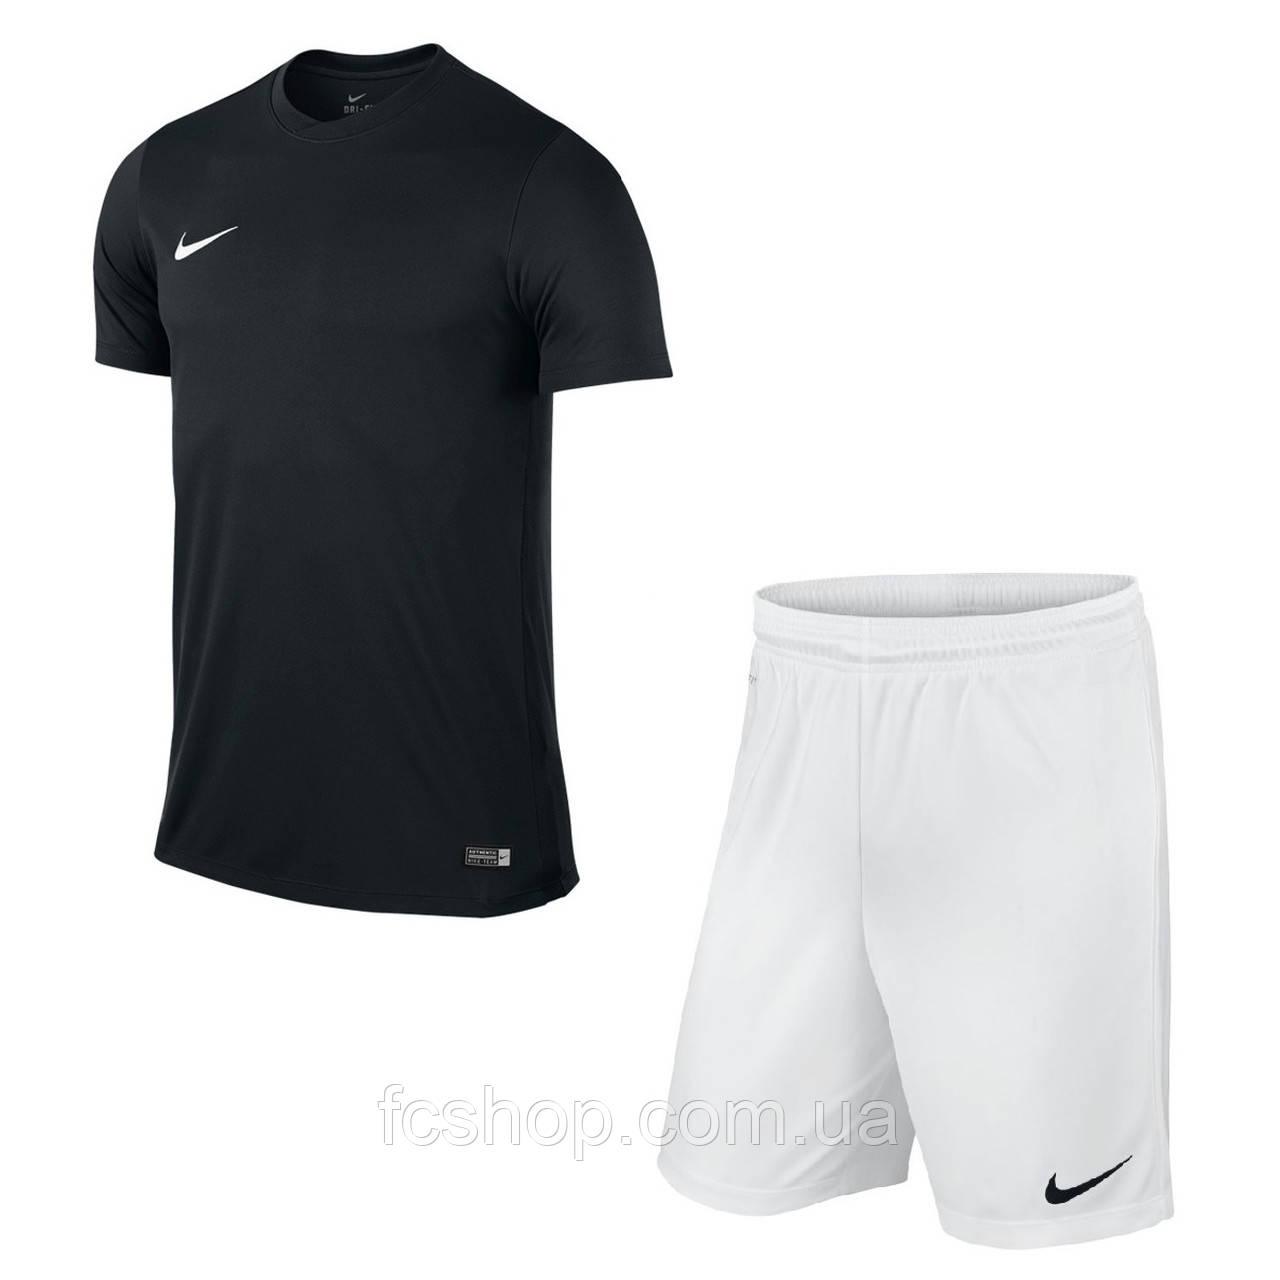 Футбольная форма для команд черно-белая Nike Park VI купить, цена в ... 613b063a6c6